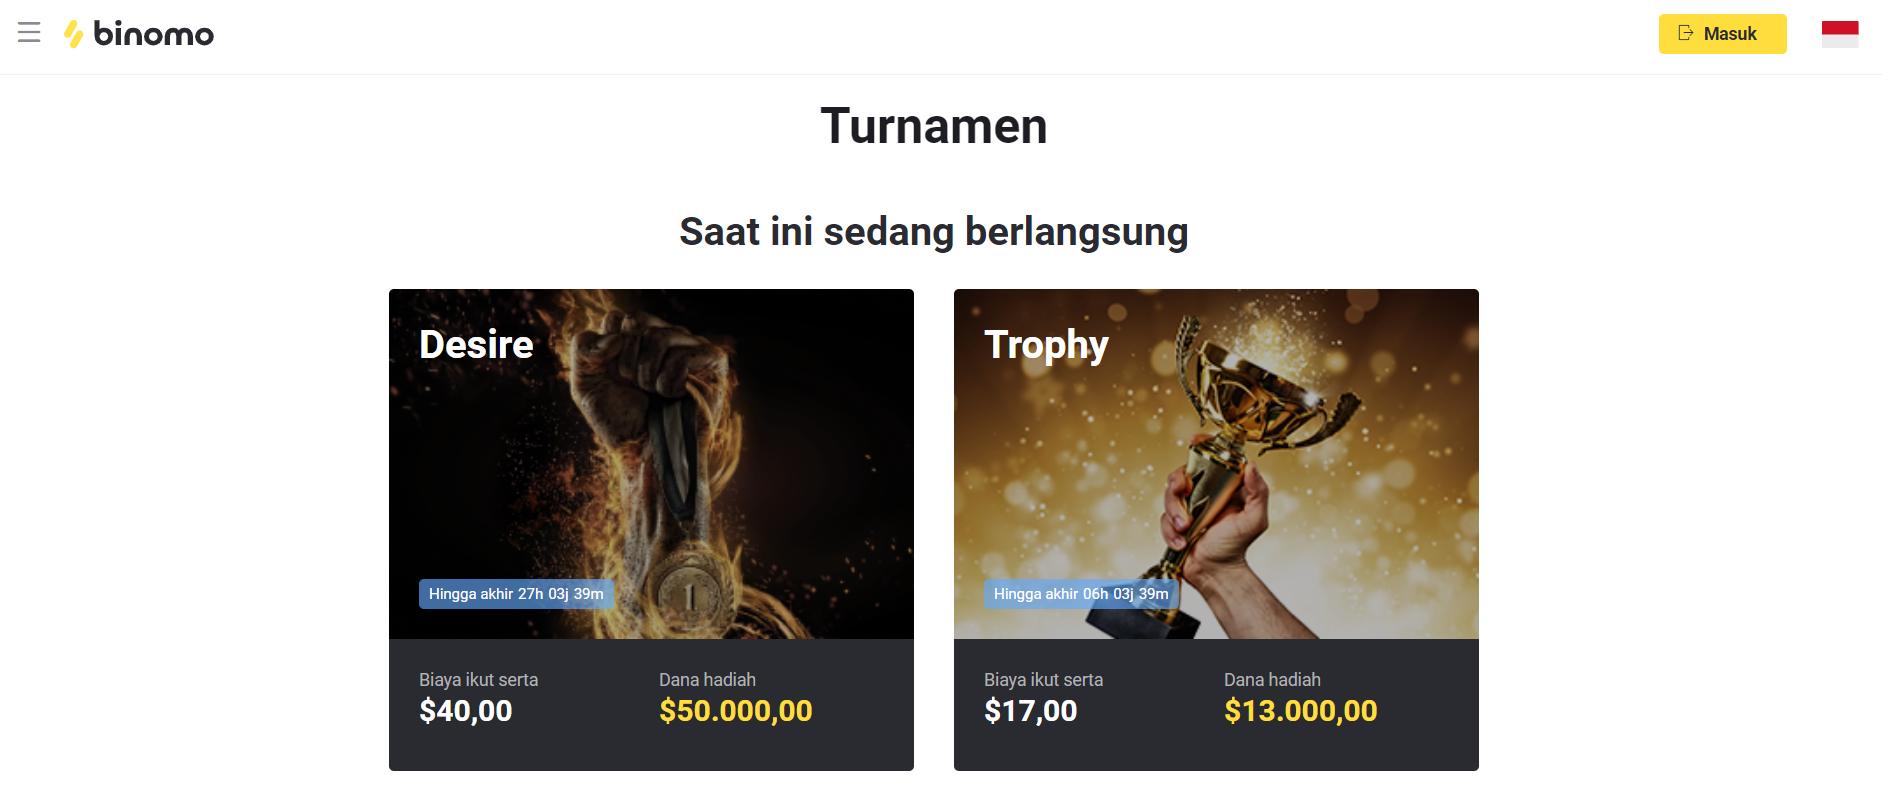 binomo tournaments indonesia